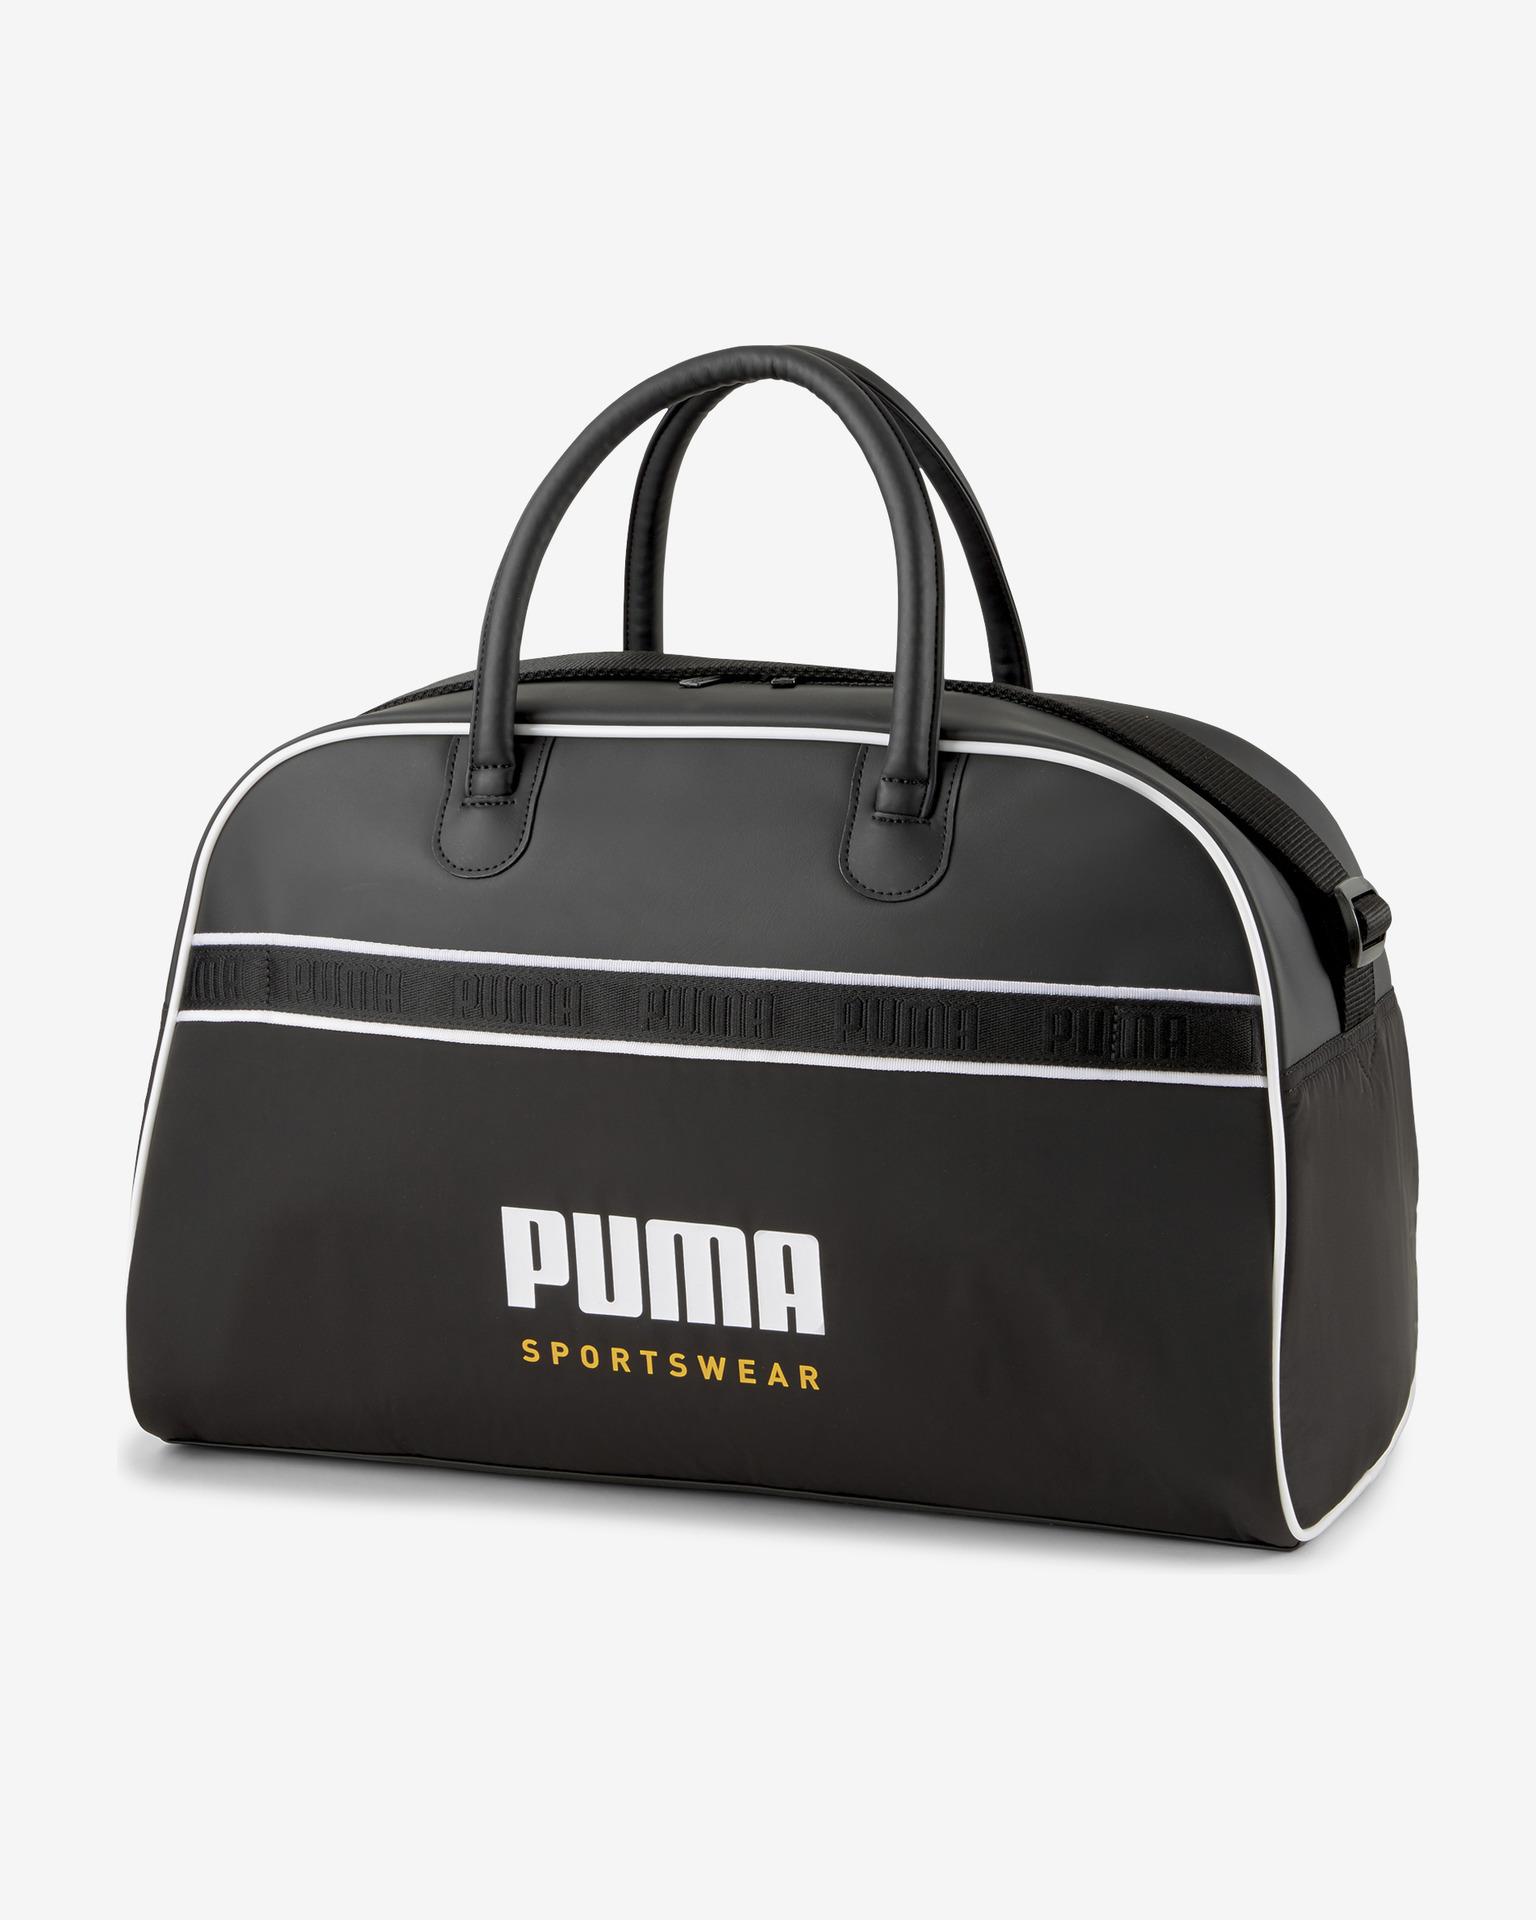 Puma Torba damska czarny  Grib